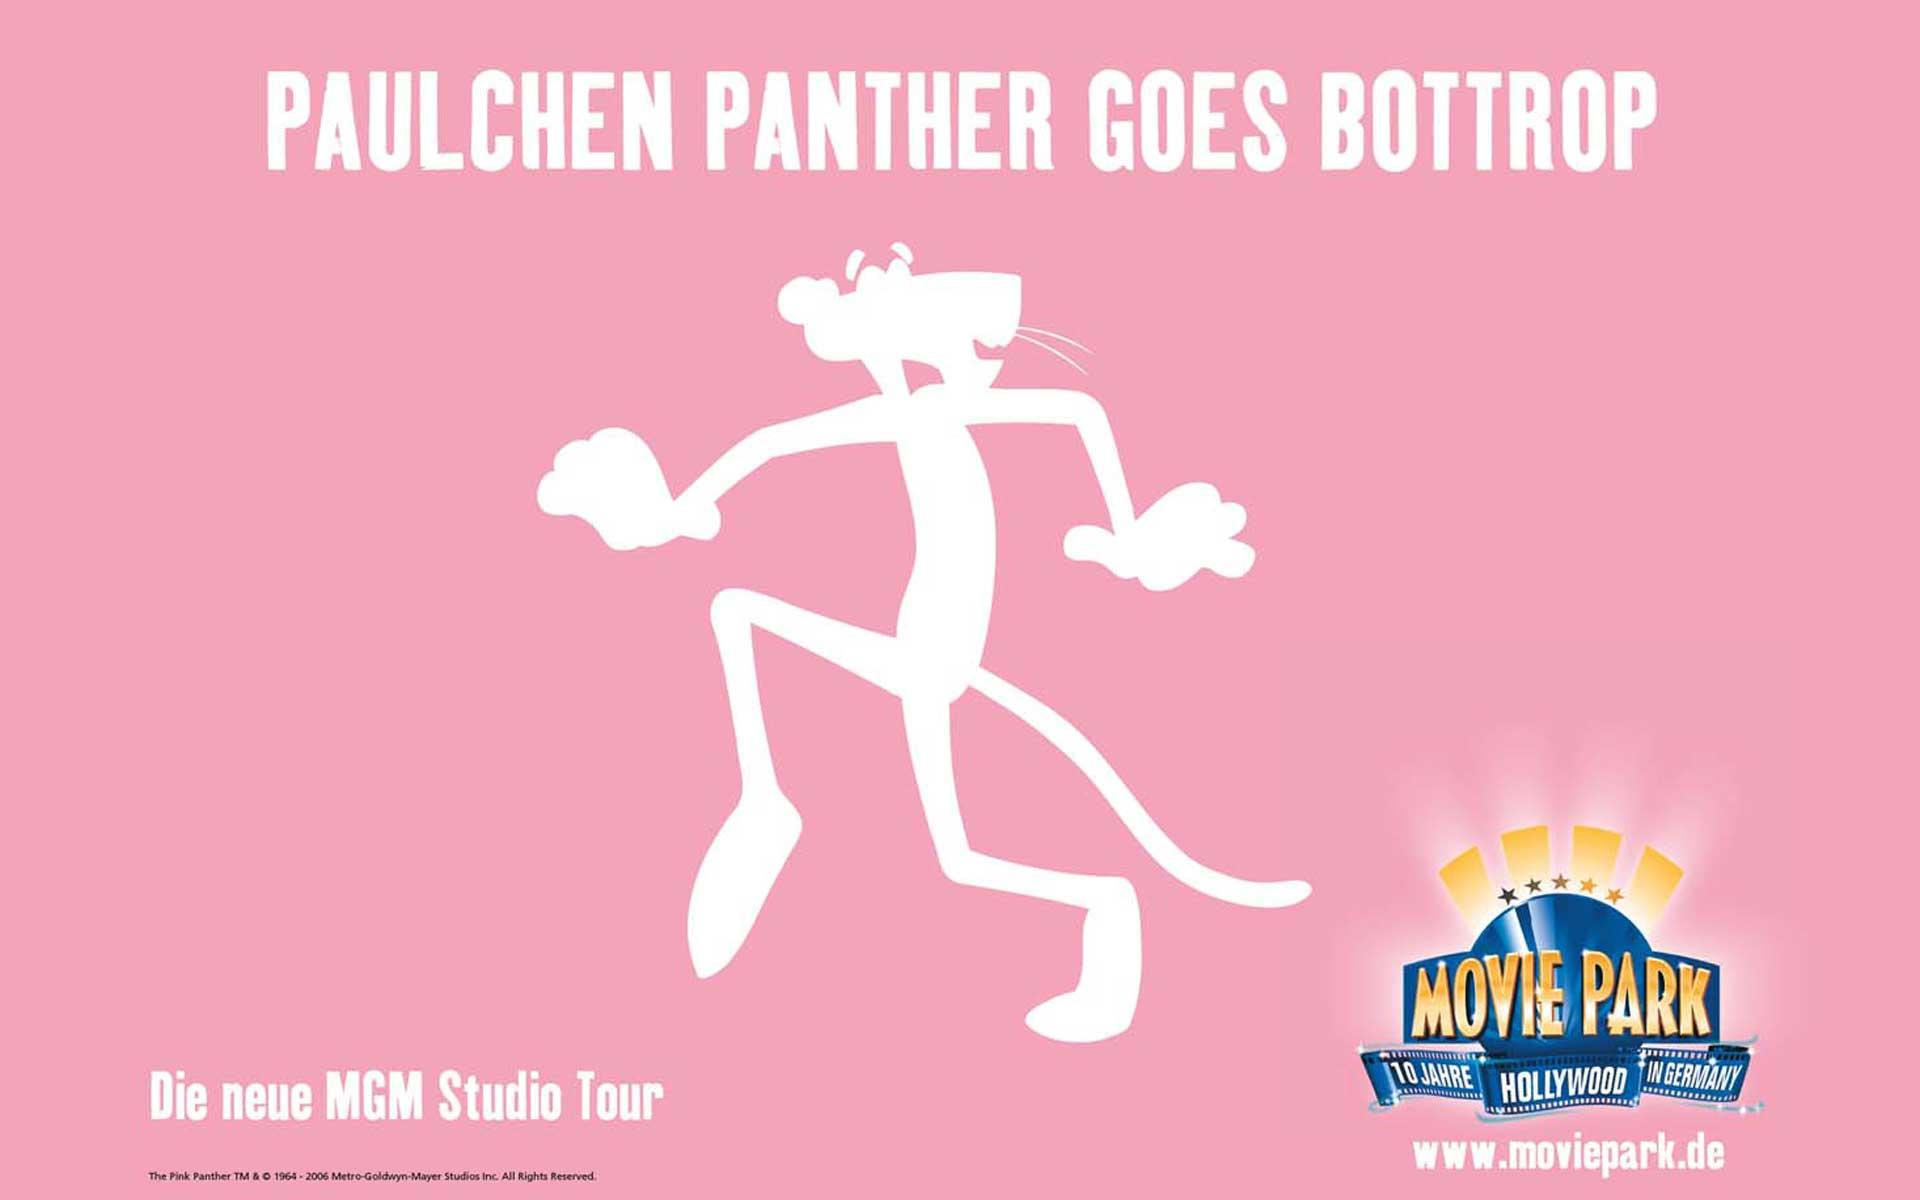 Blow Up Plakat; Motiv Paulchen Panther